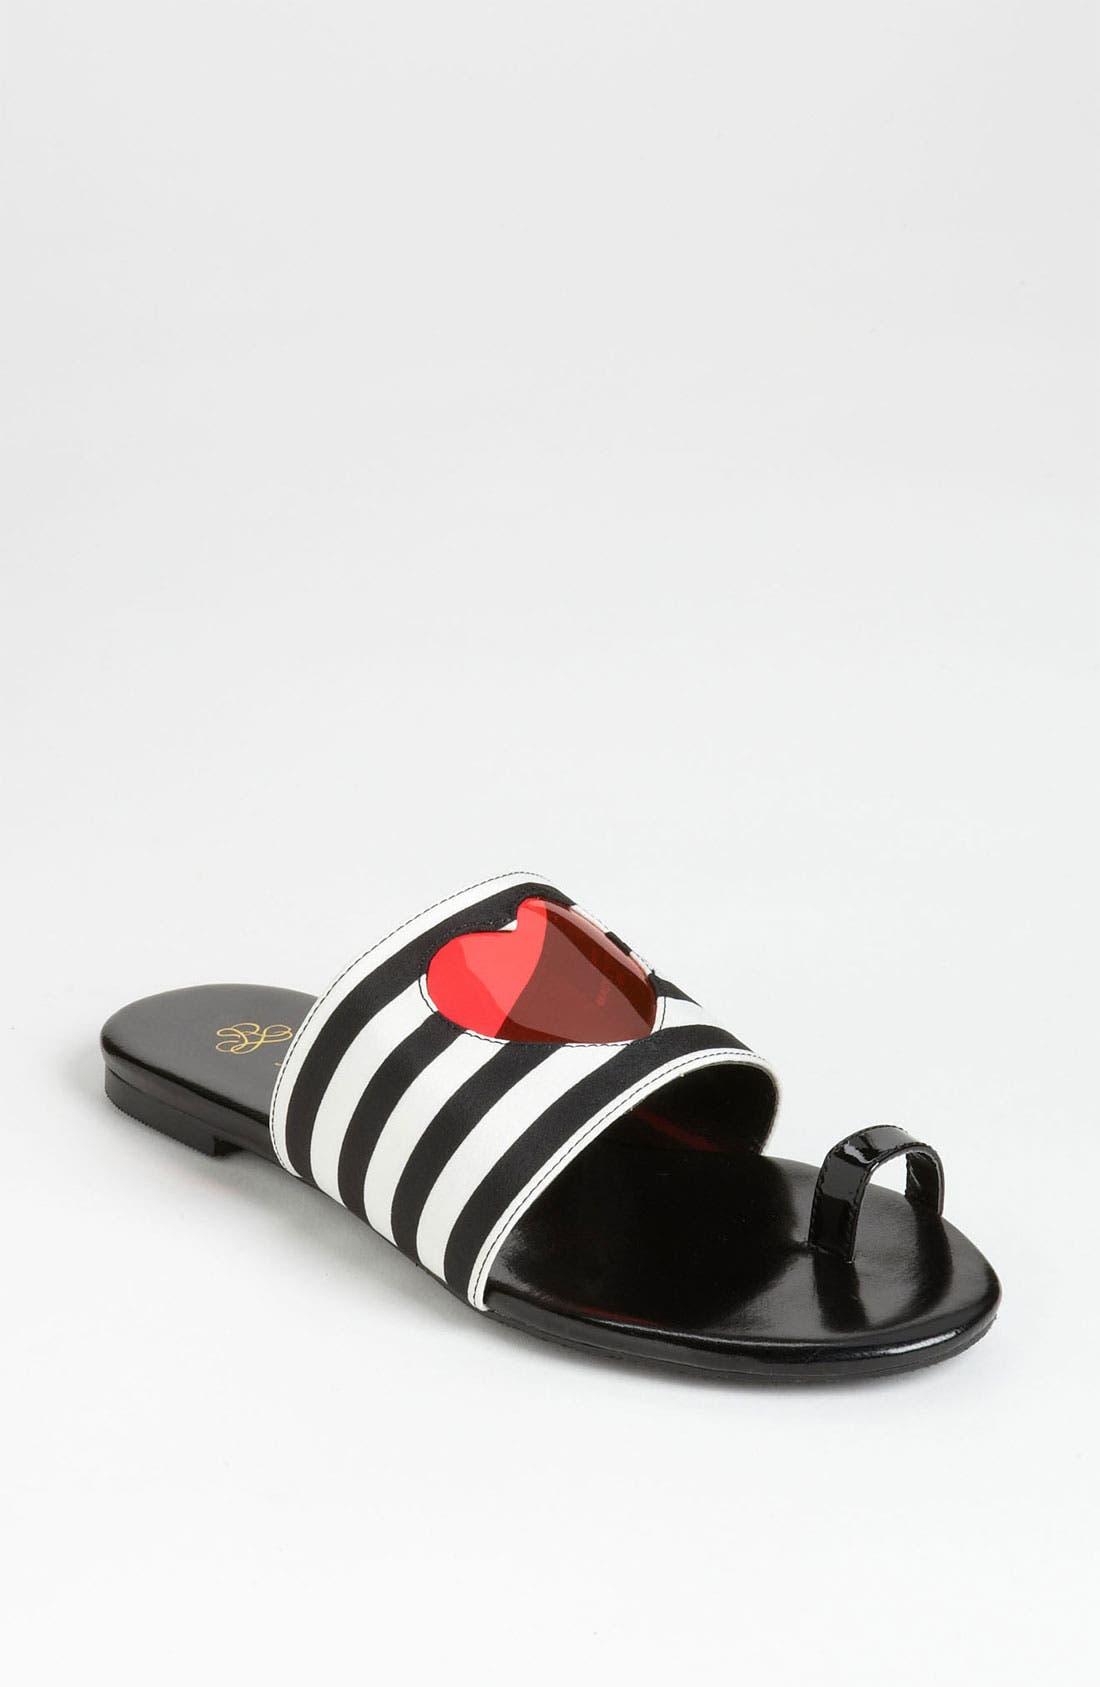 Main Image - J. Reneé 'Spry' Sandal